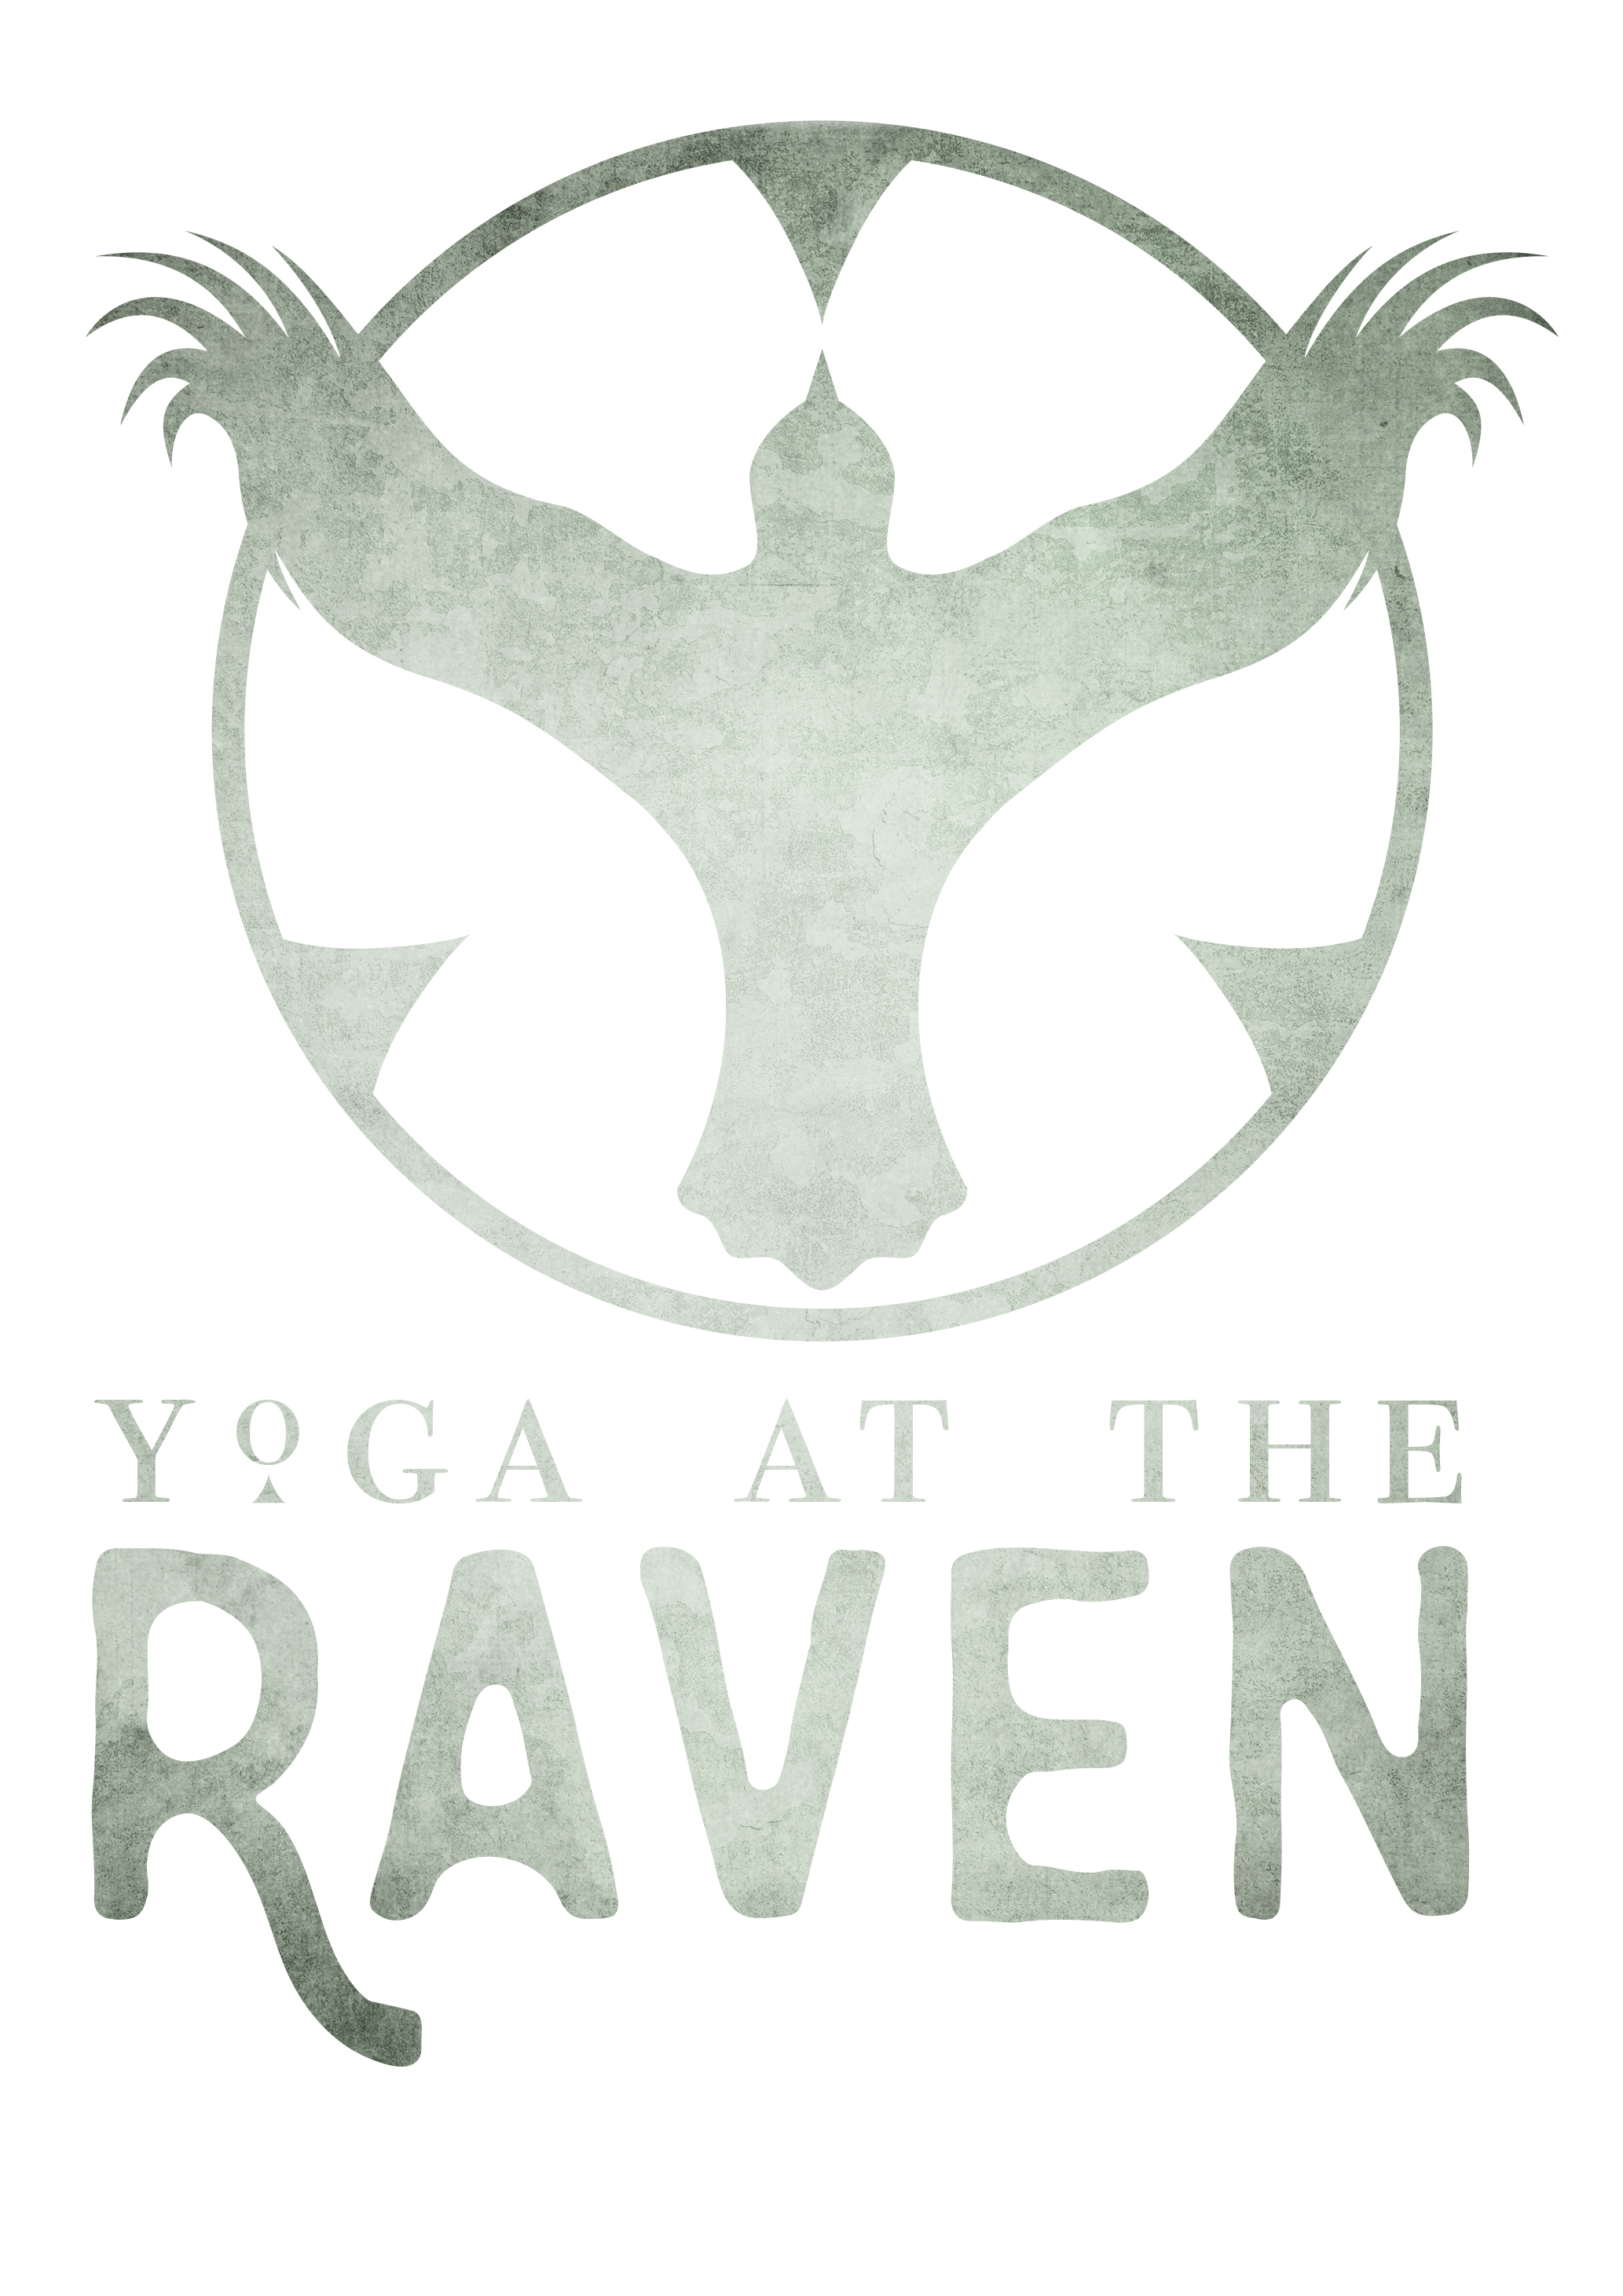 Raven_logotype_final.jpg